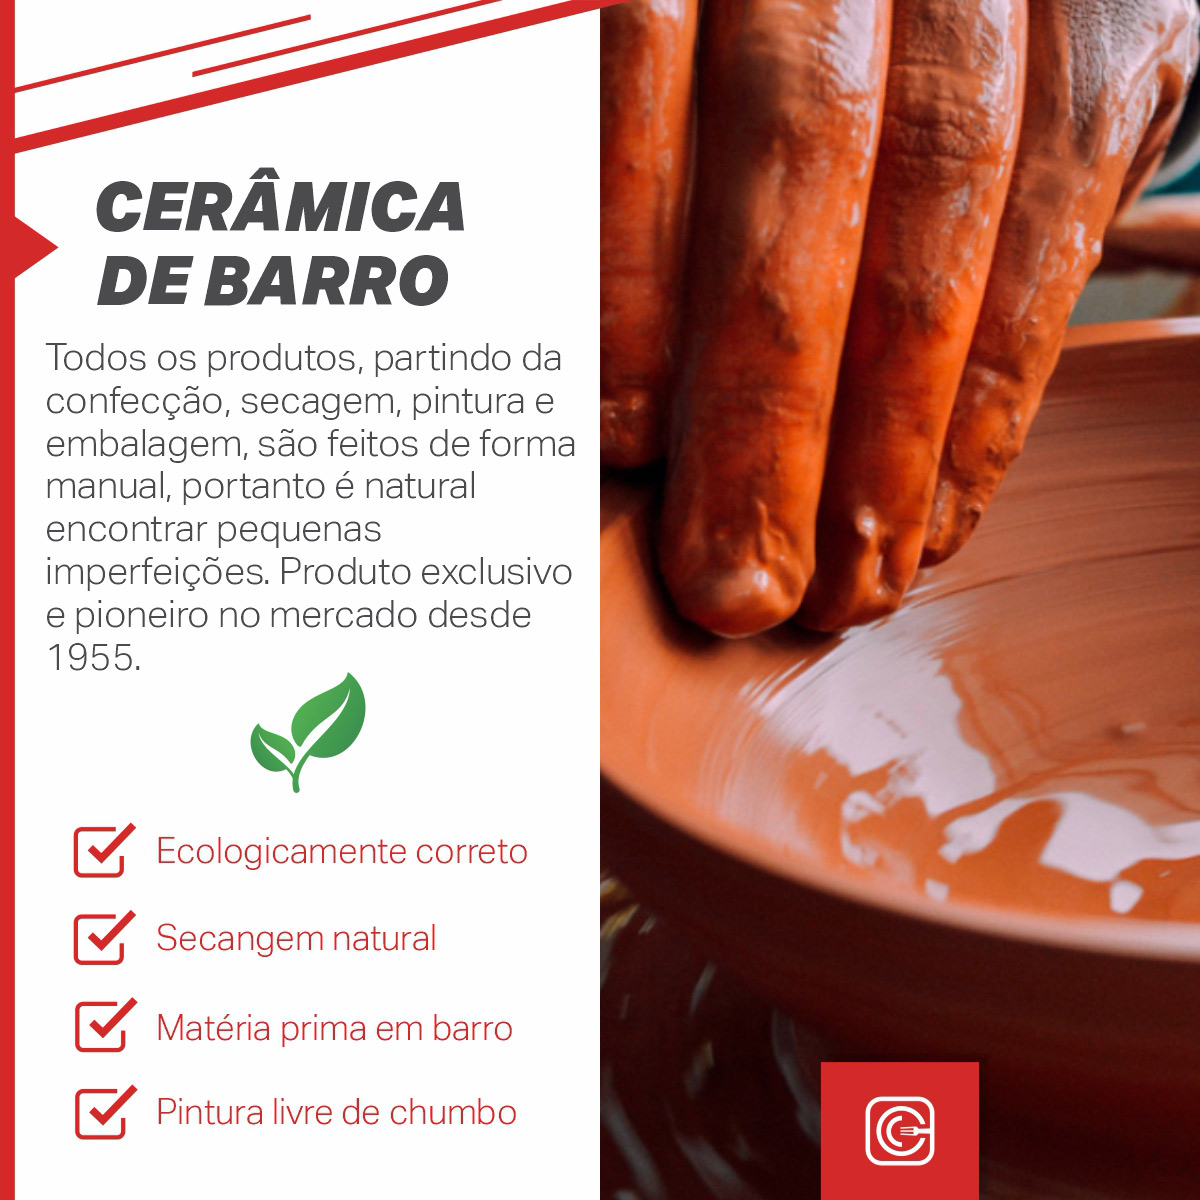 Conjunto para fondue de Cerâmica - nº1 - 5pçs